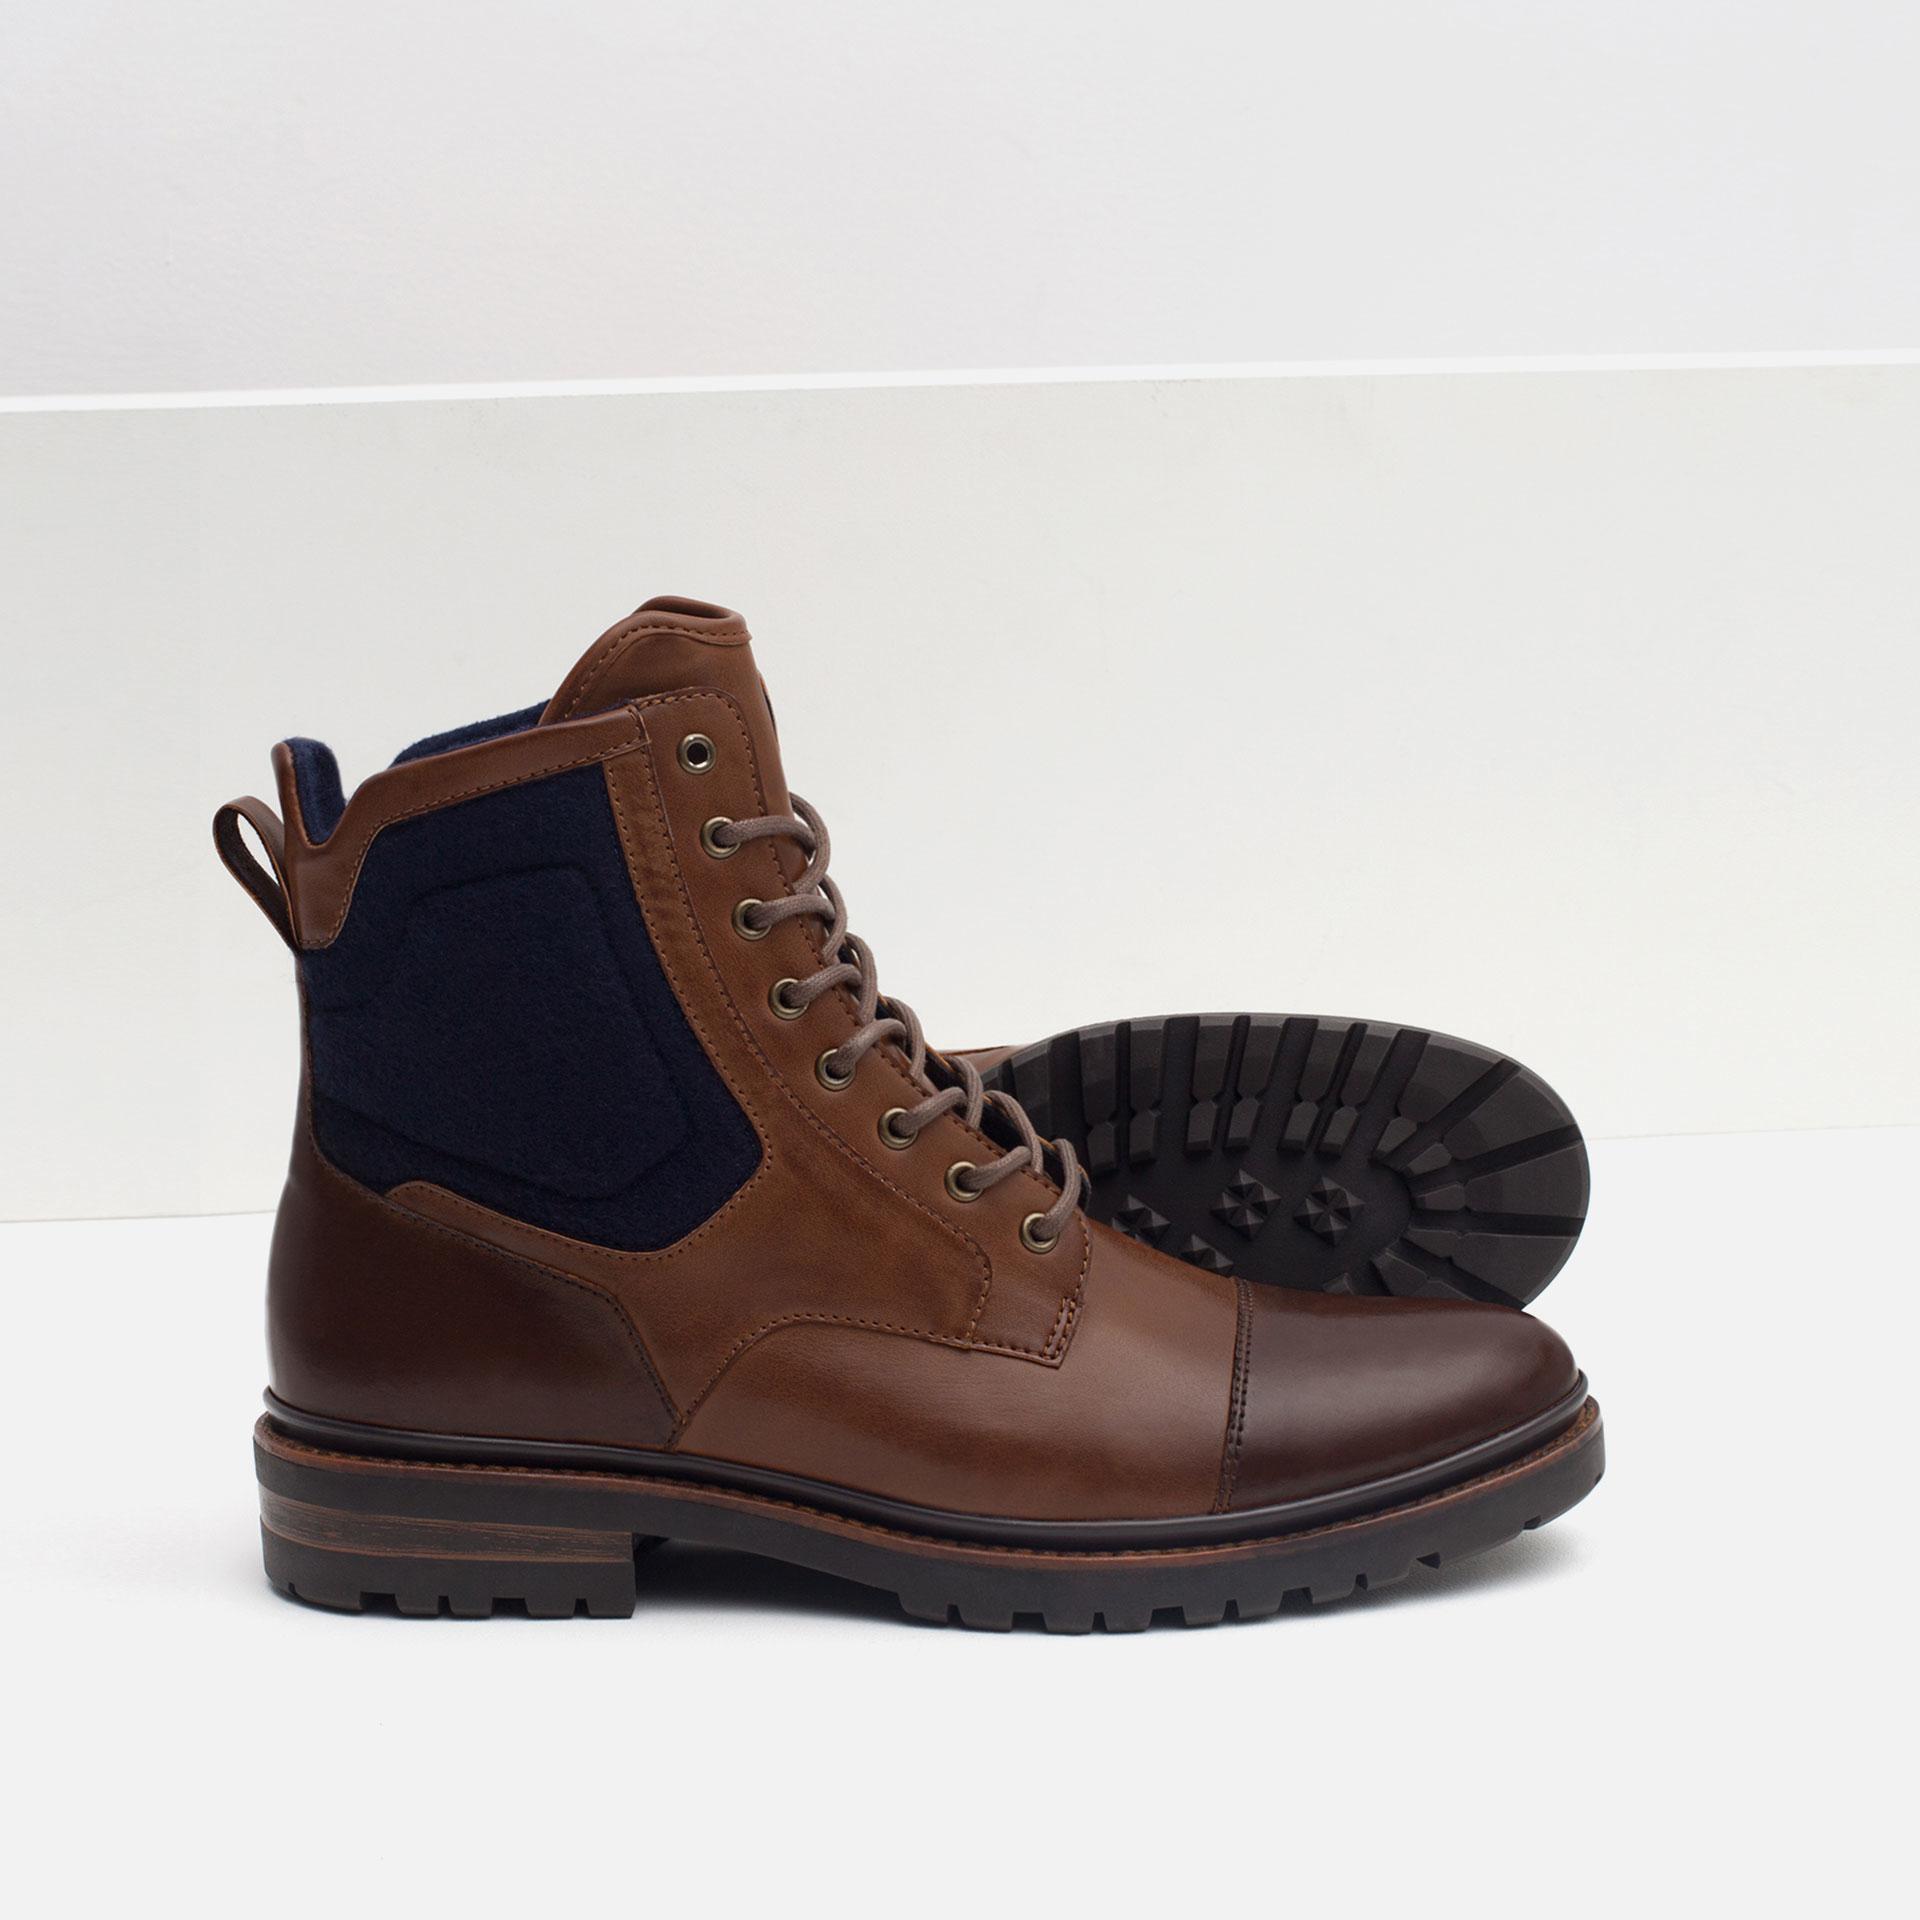 Zara Womens Shoes Australia